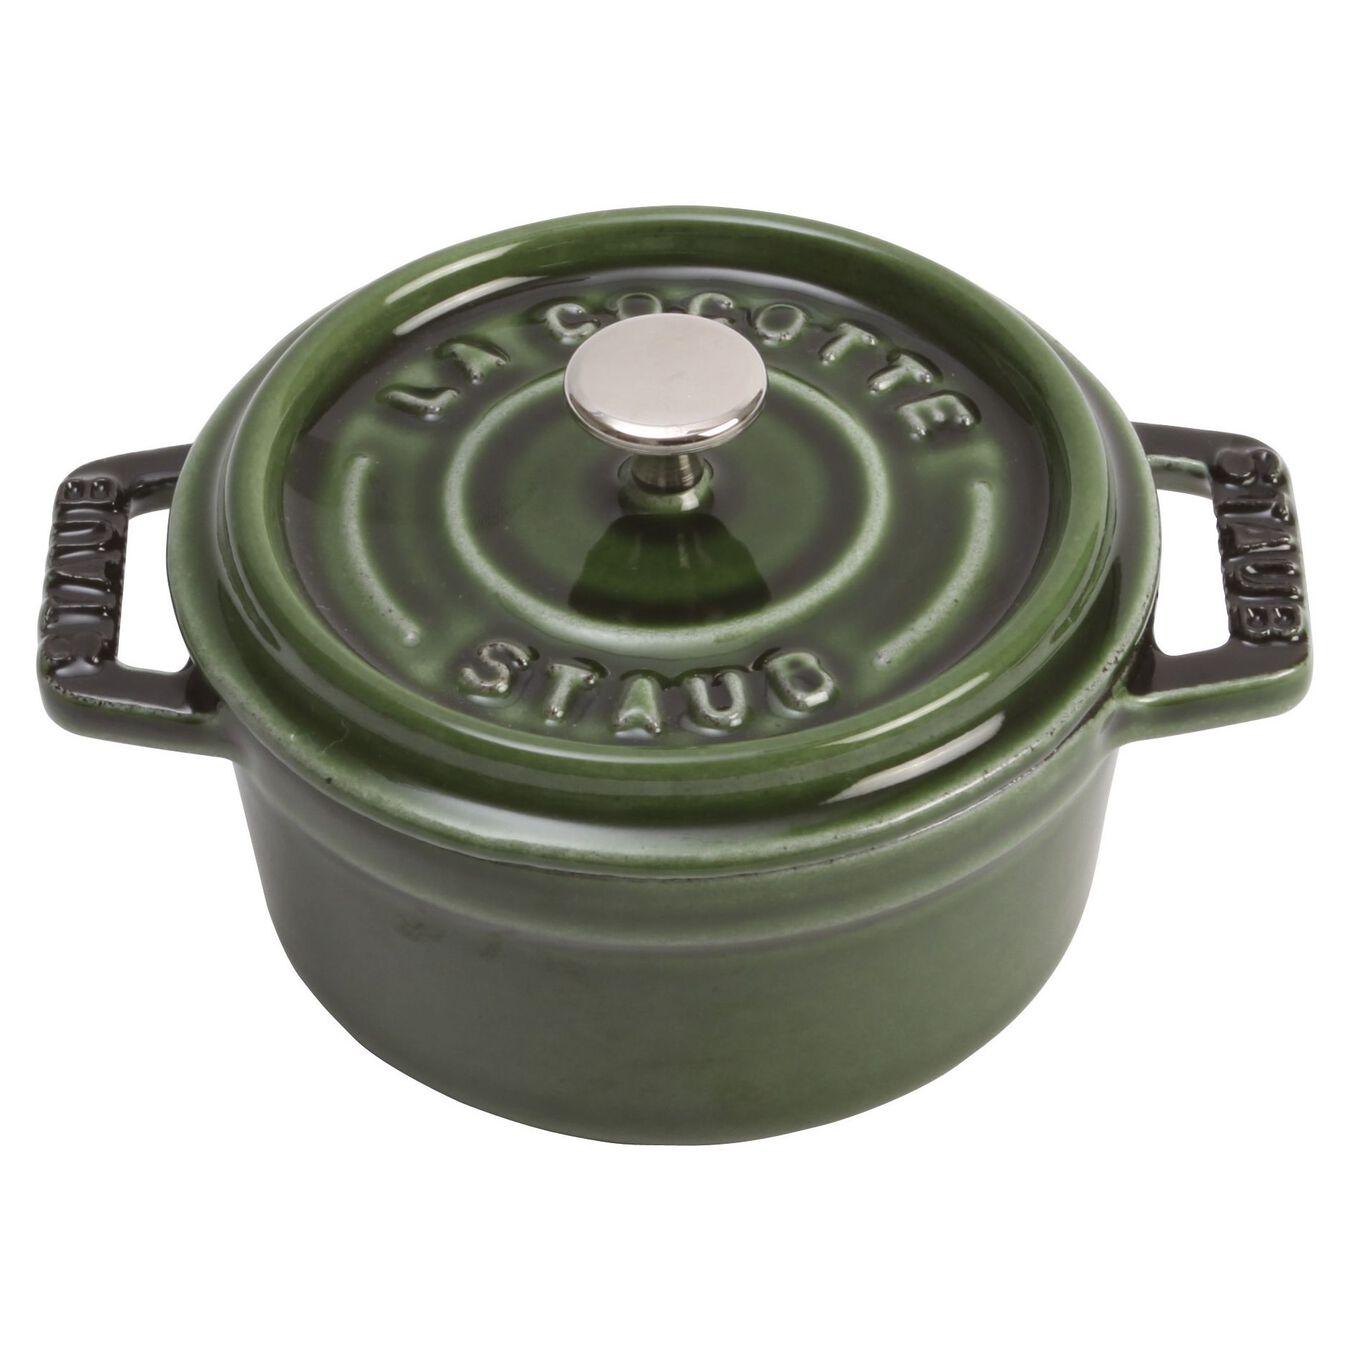 Mini Cocotte 10 cm, rund, Basilikum-Grün, Gusseisen,,large 1